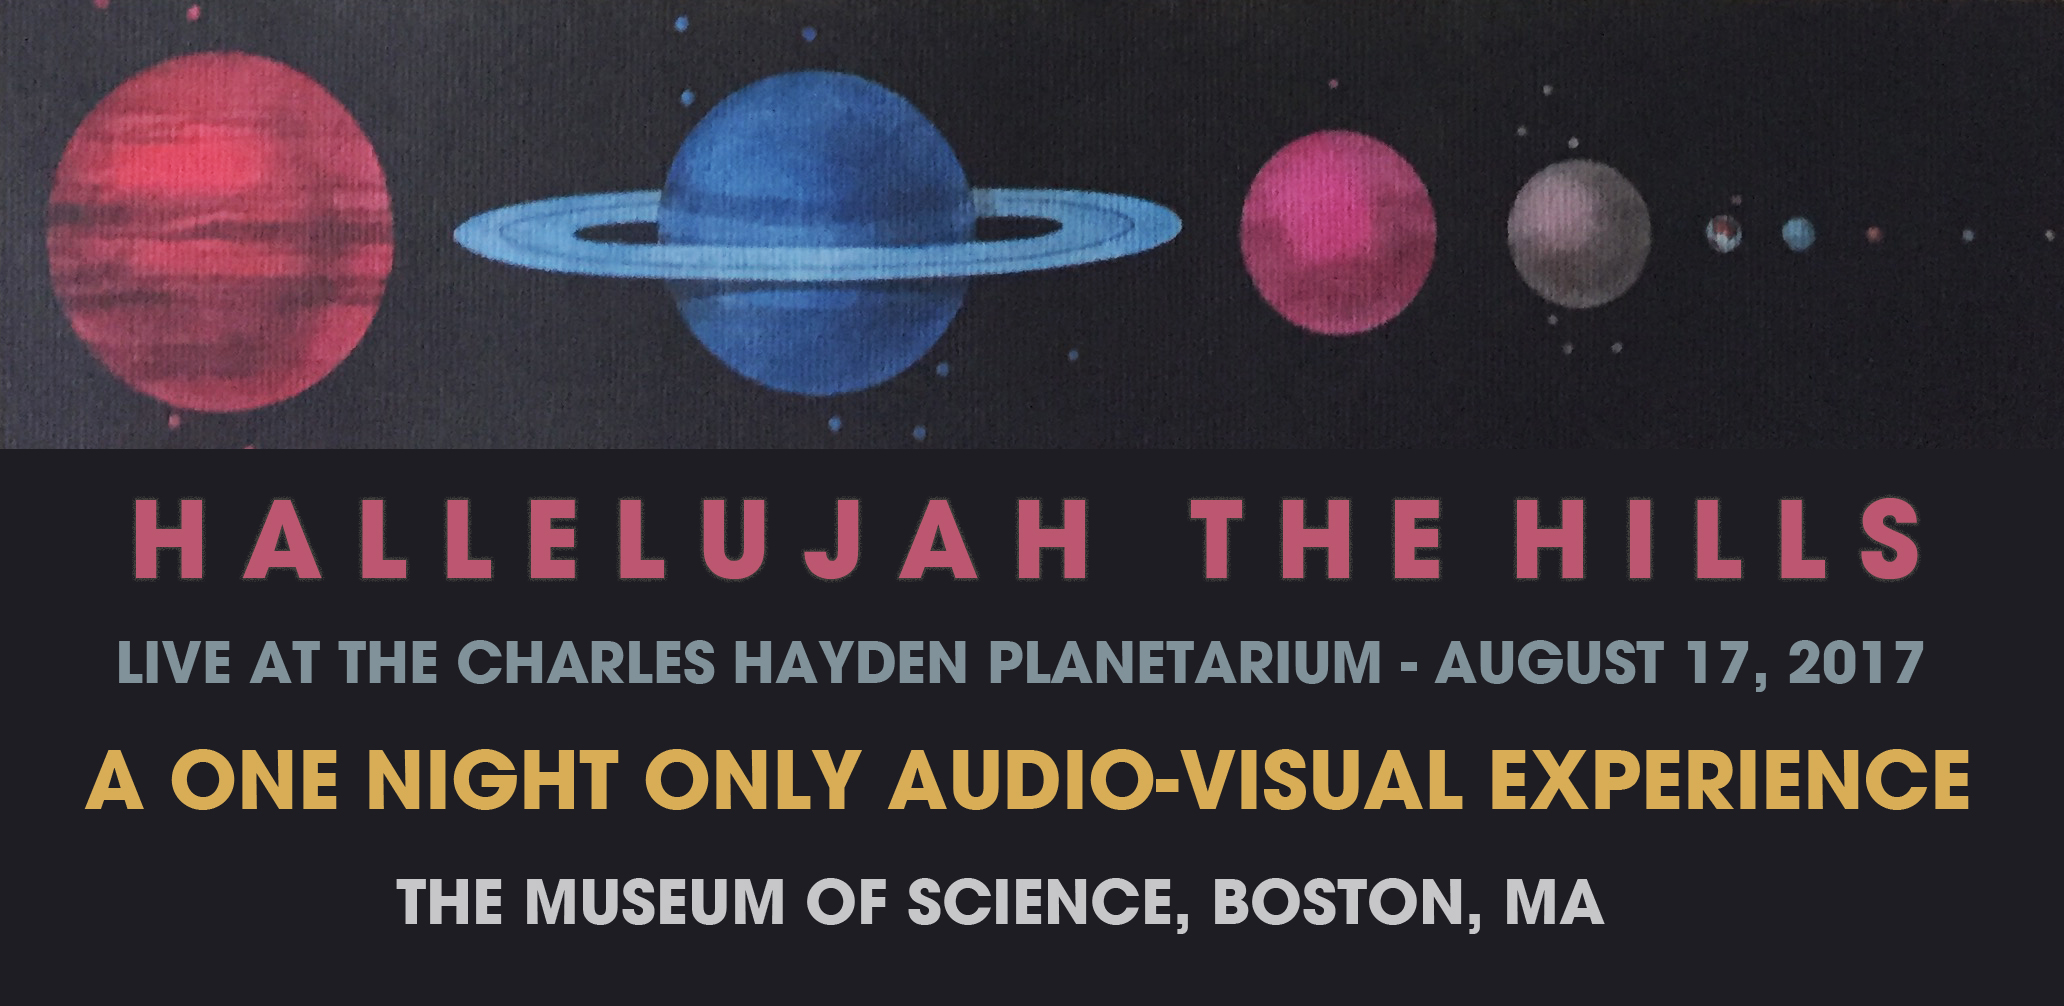 Live at the Charles Hayden Planetarium